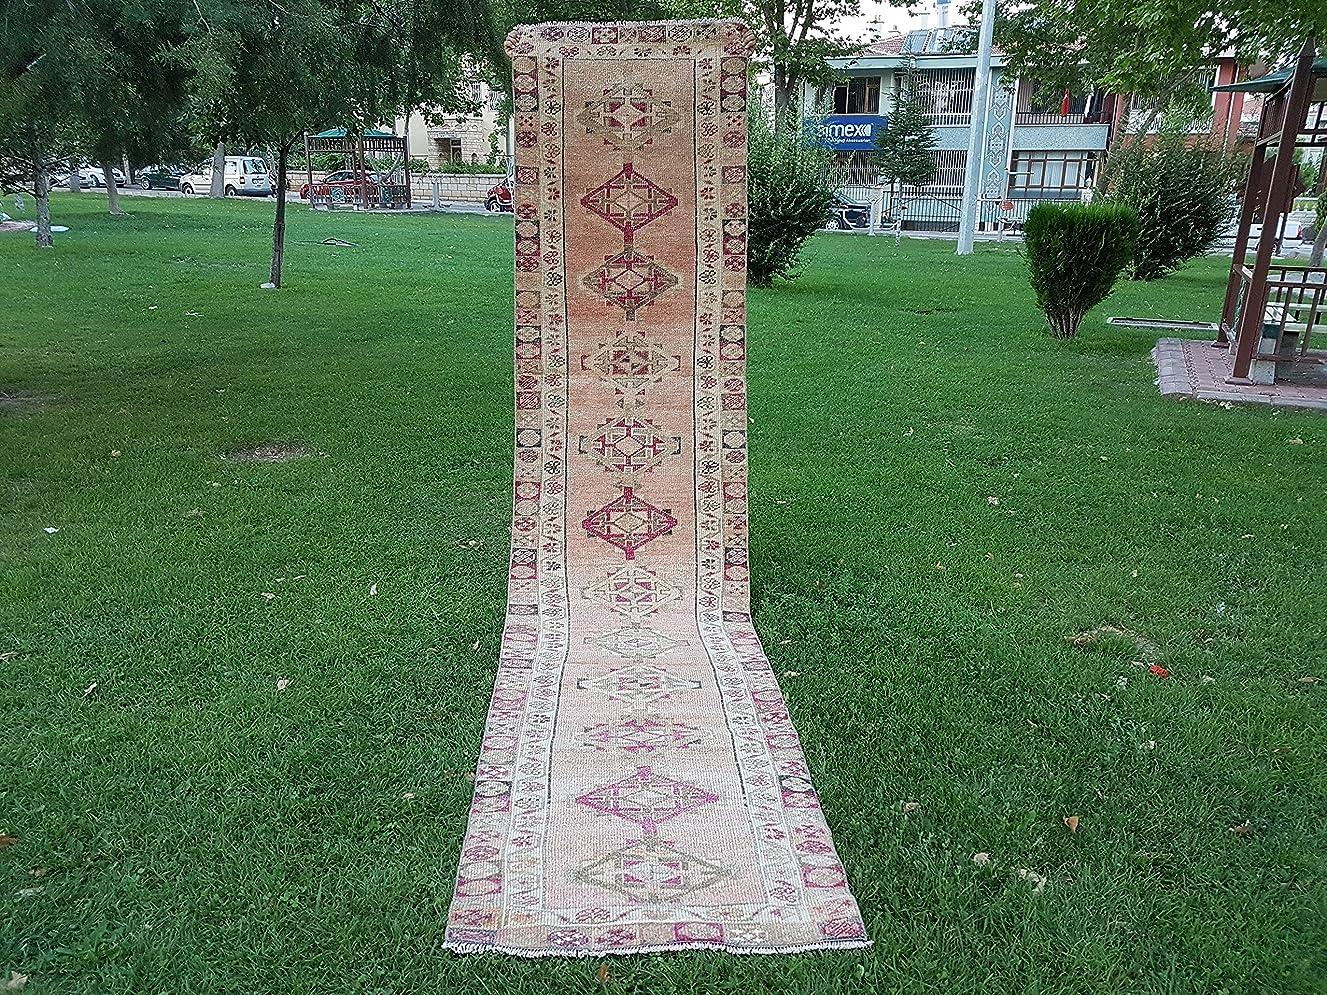 Vintage Anatolian Muted Oushak Rug, Wool Mediterranean Antique Carpet, Handmade Turkish Pastel Area Rug Runner 2.9 x 12.7 Ft (87 x 388 Cm)